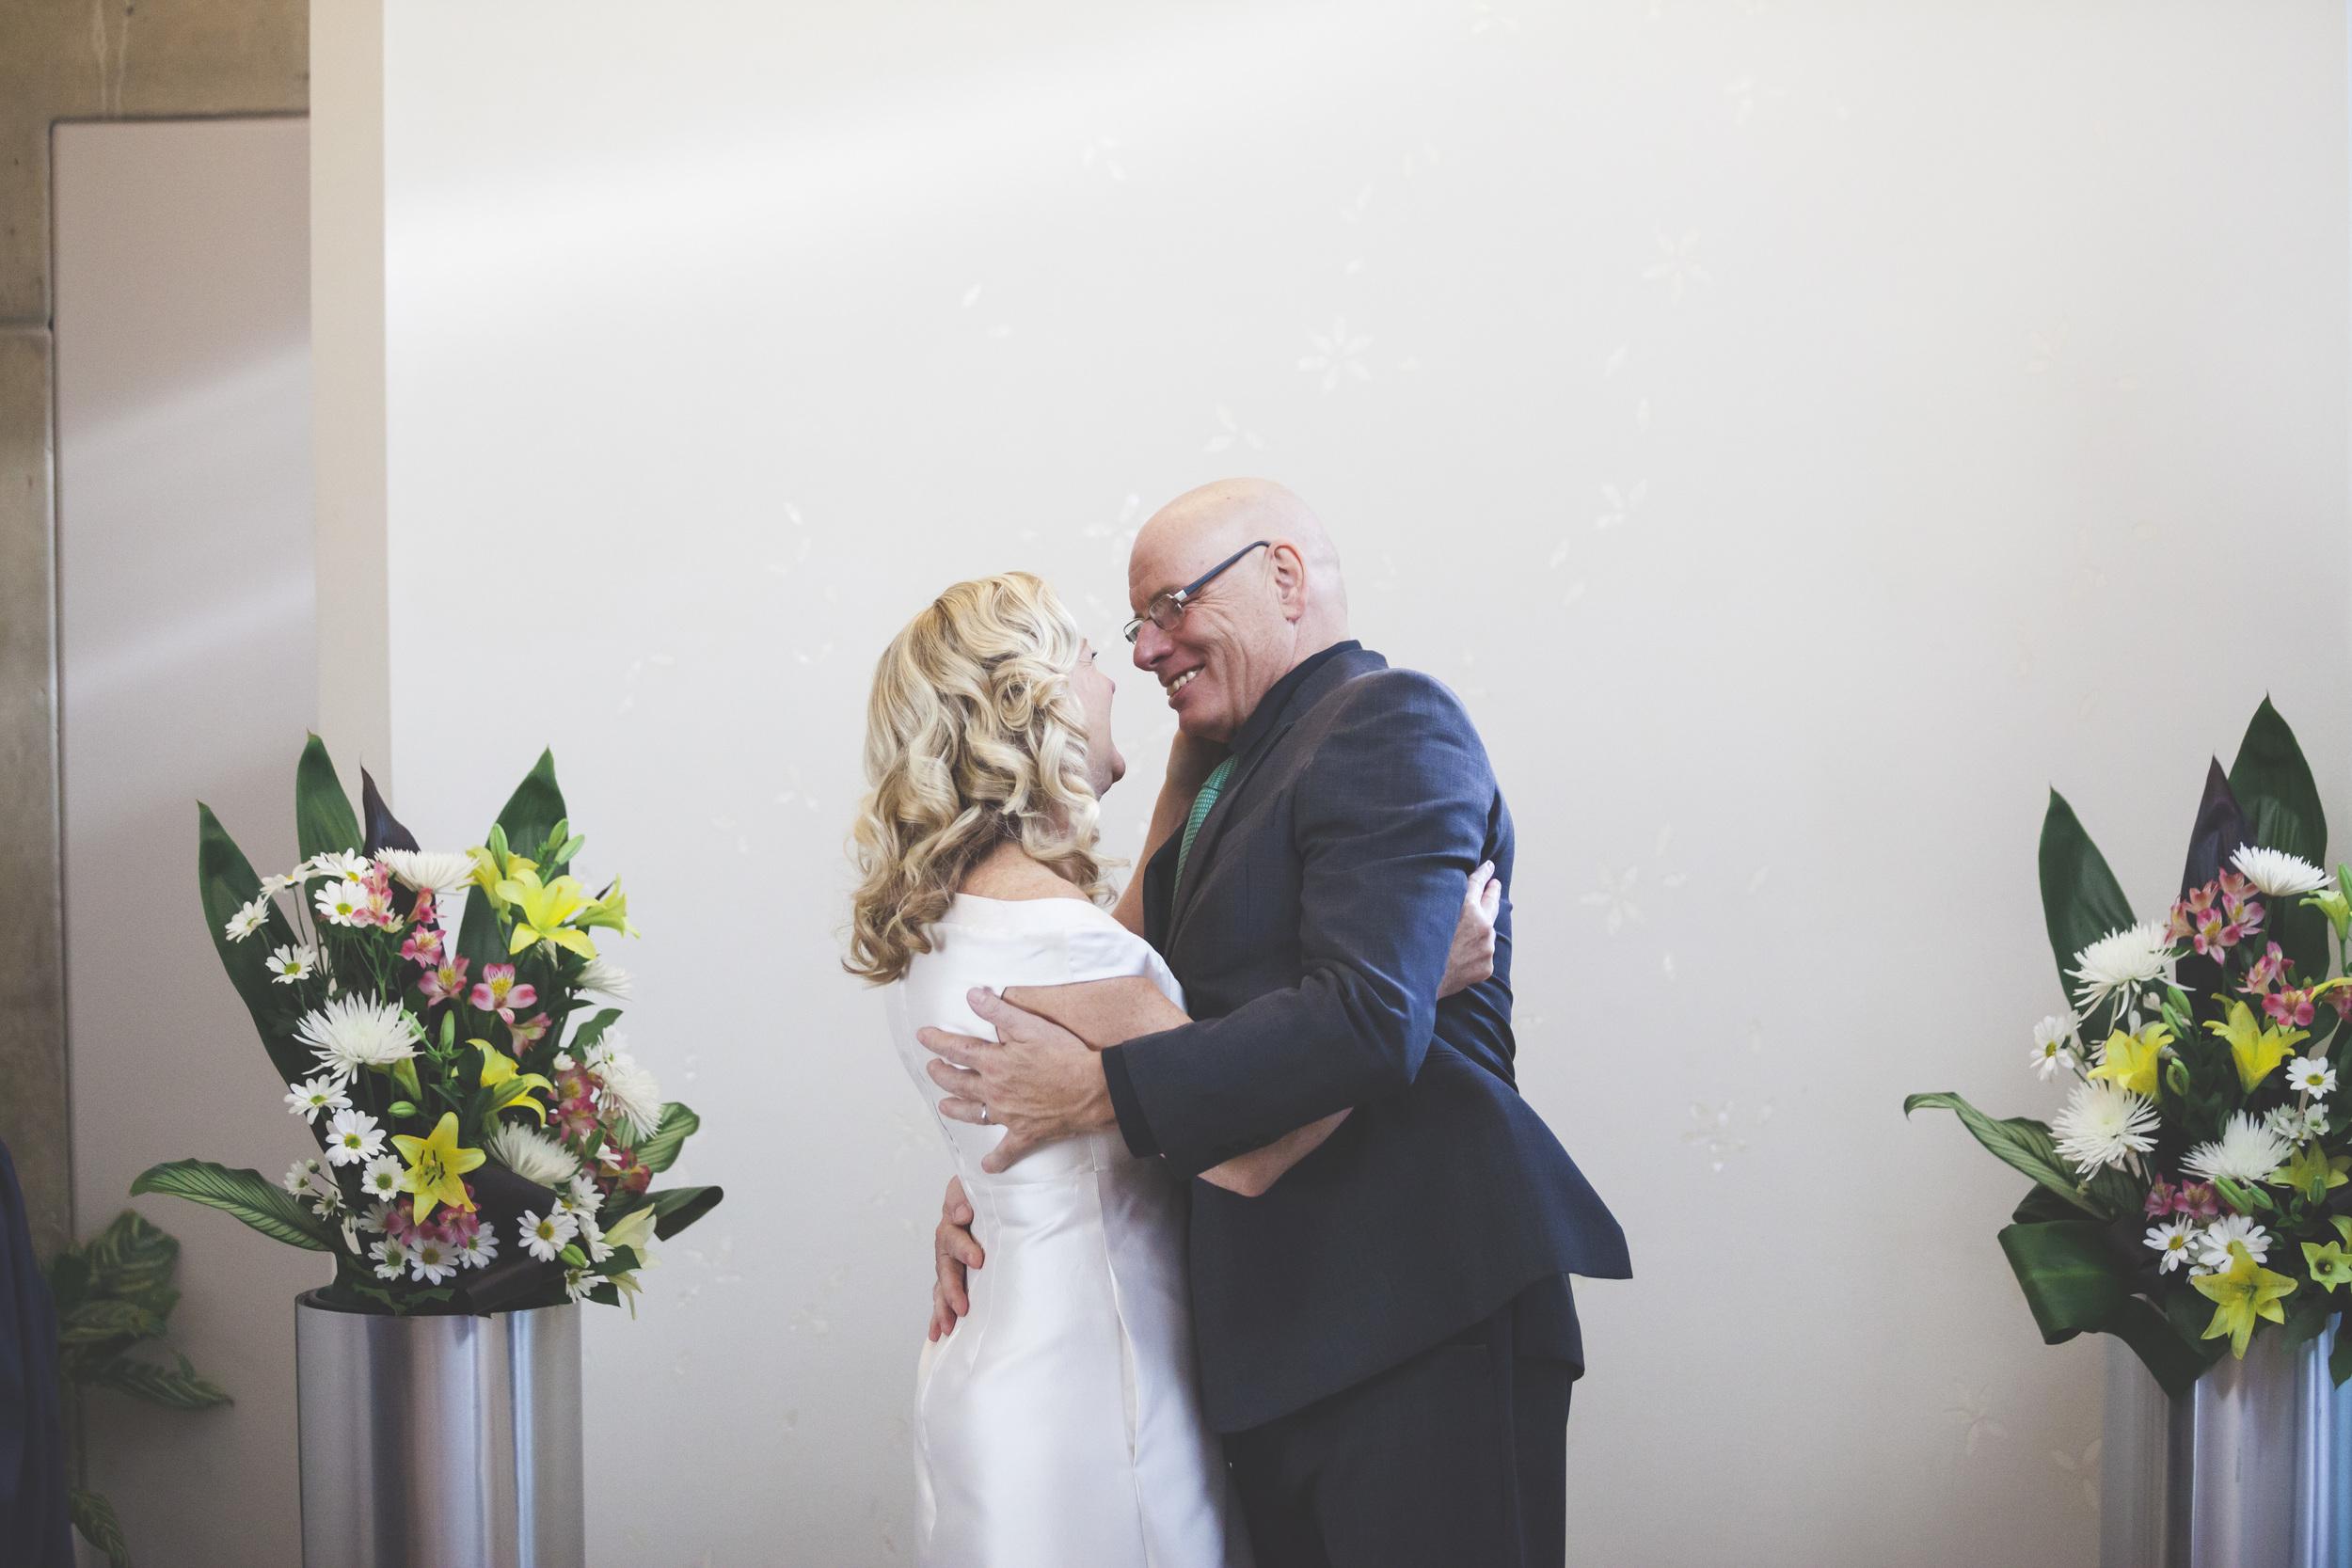 Marriage ceremony at Toronto City Hall.